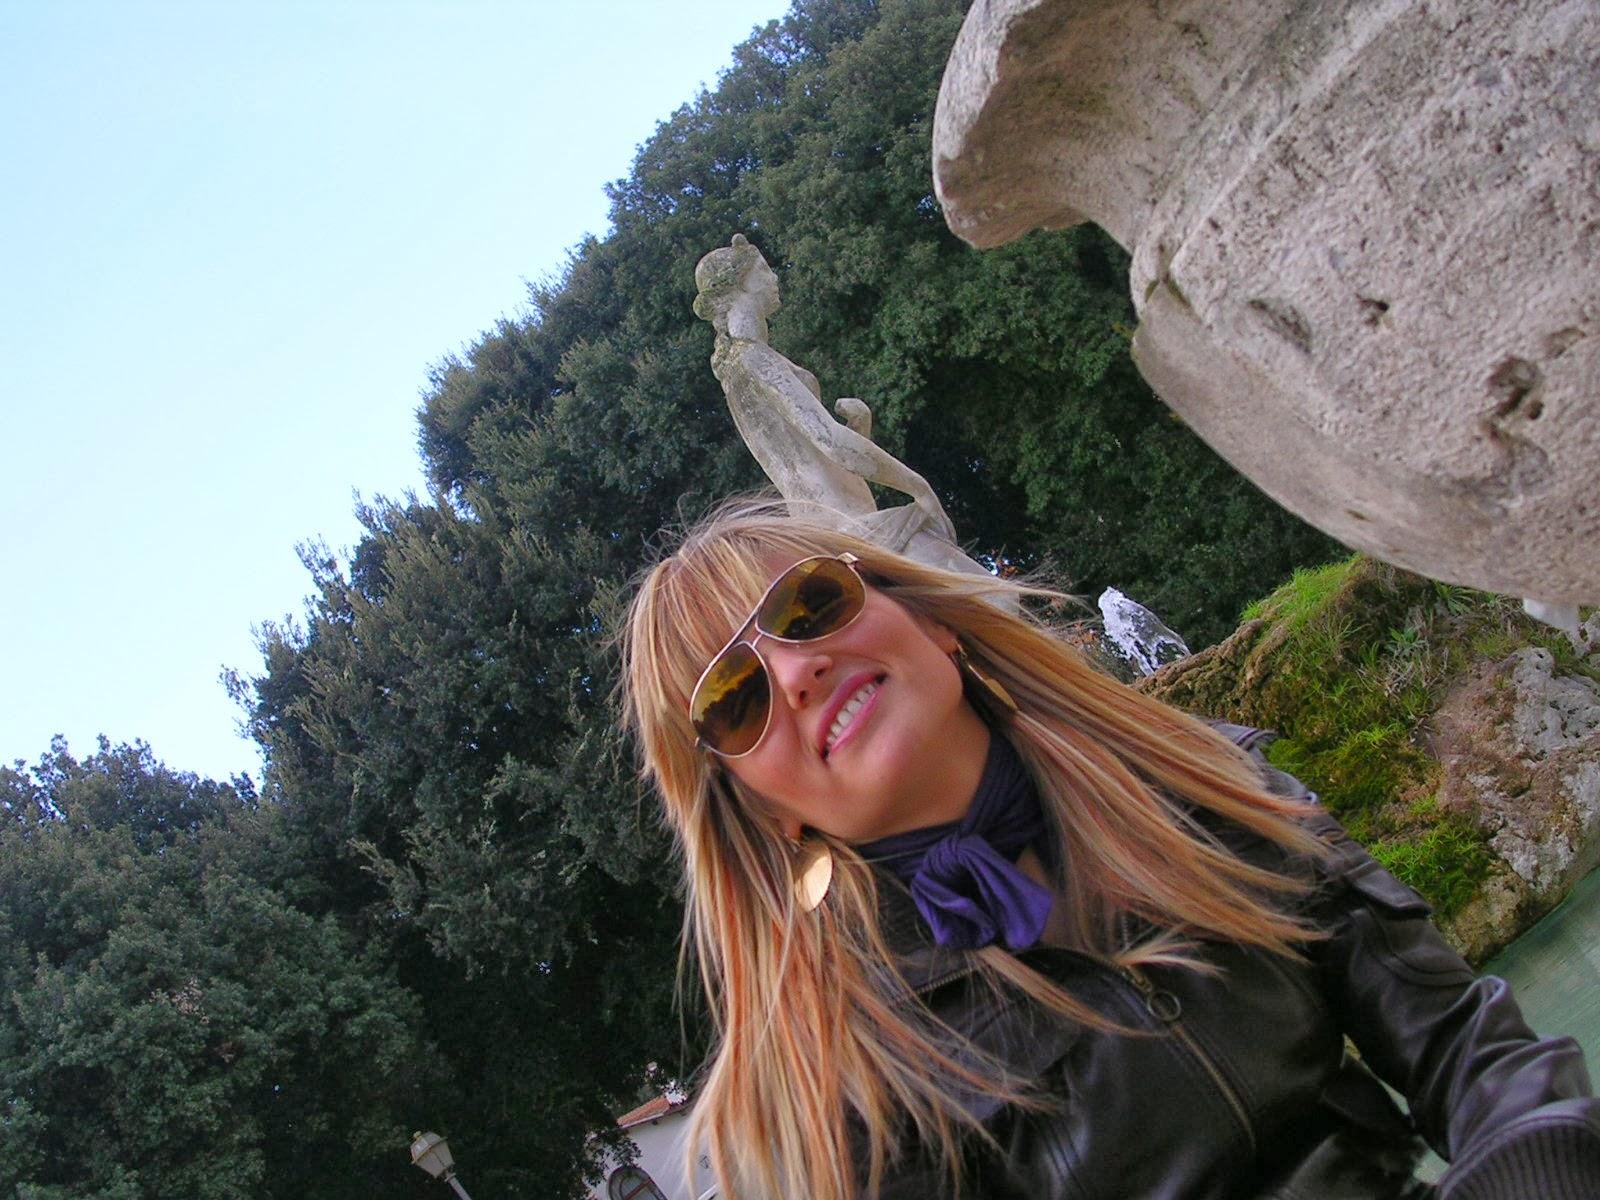 capelli biondi - roma